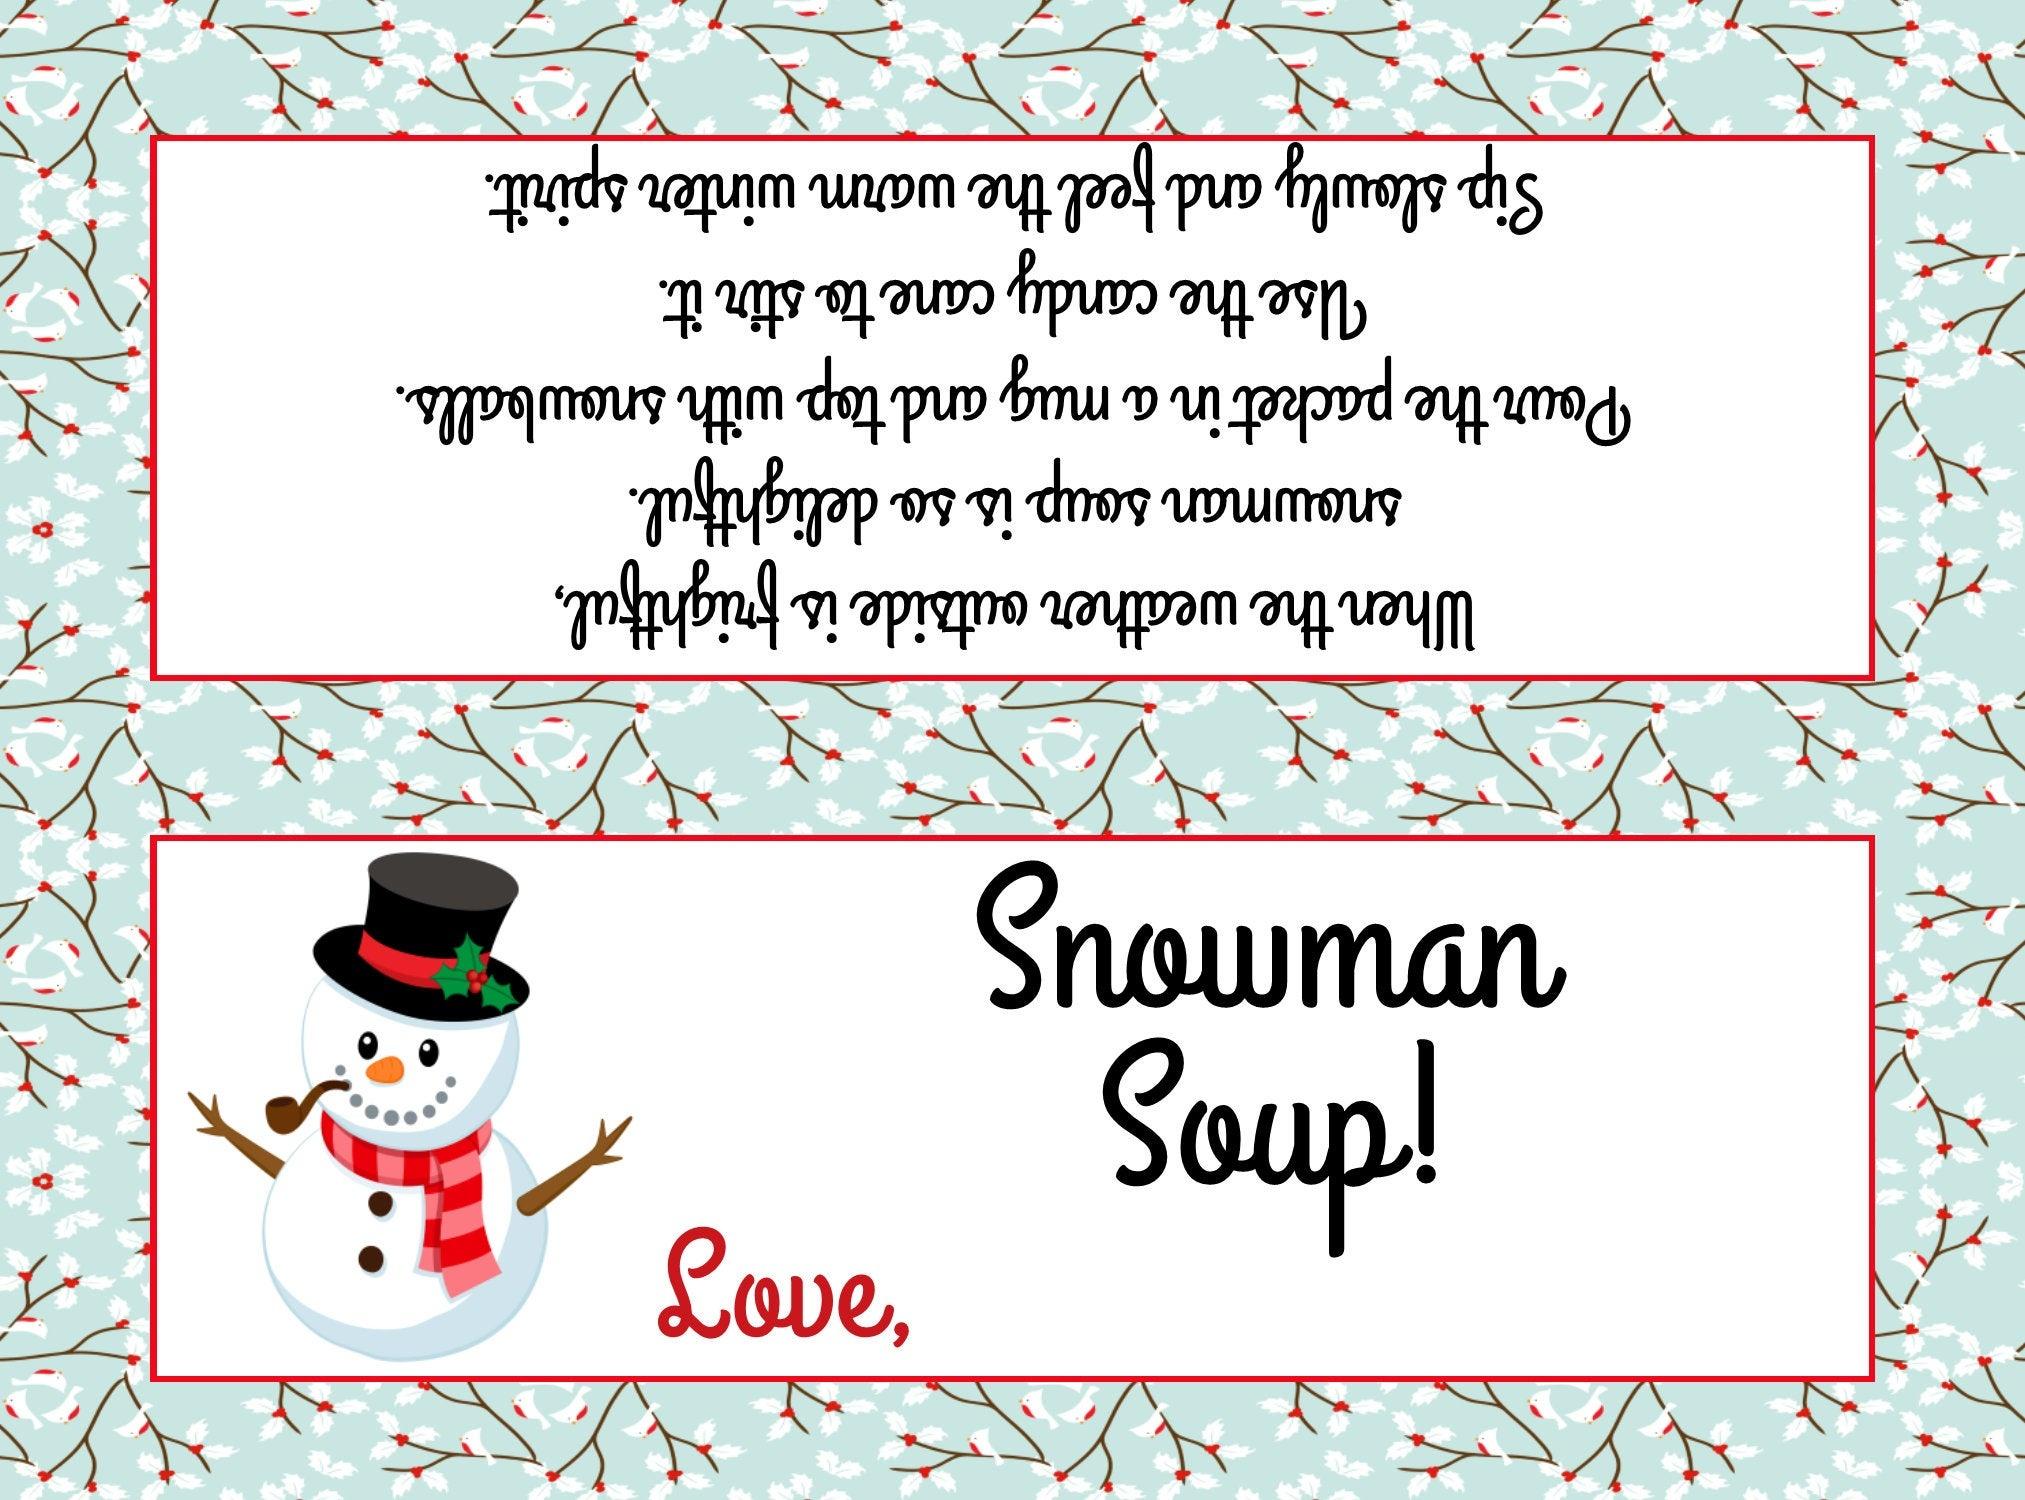 Snowman Soup Bag Topper Fits Plastic Sandwich Bags | Etsy - Snowman Soup Free Printable